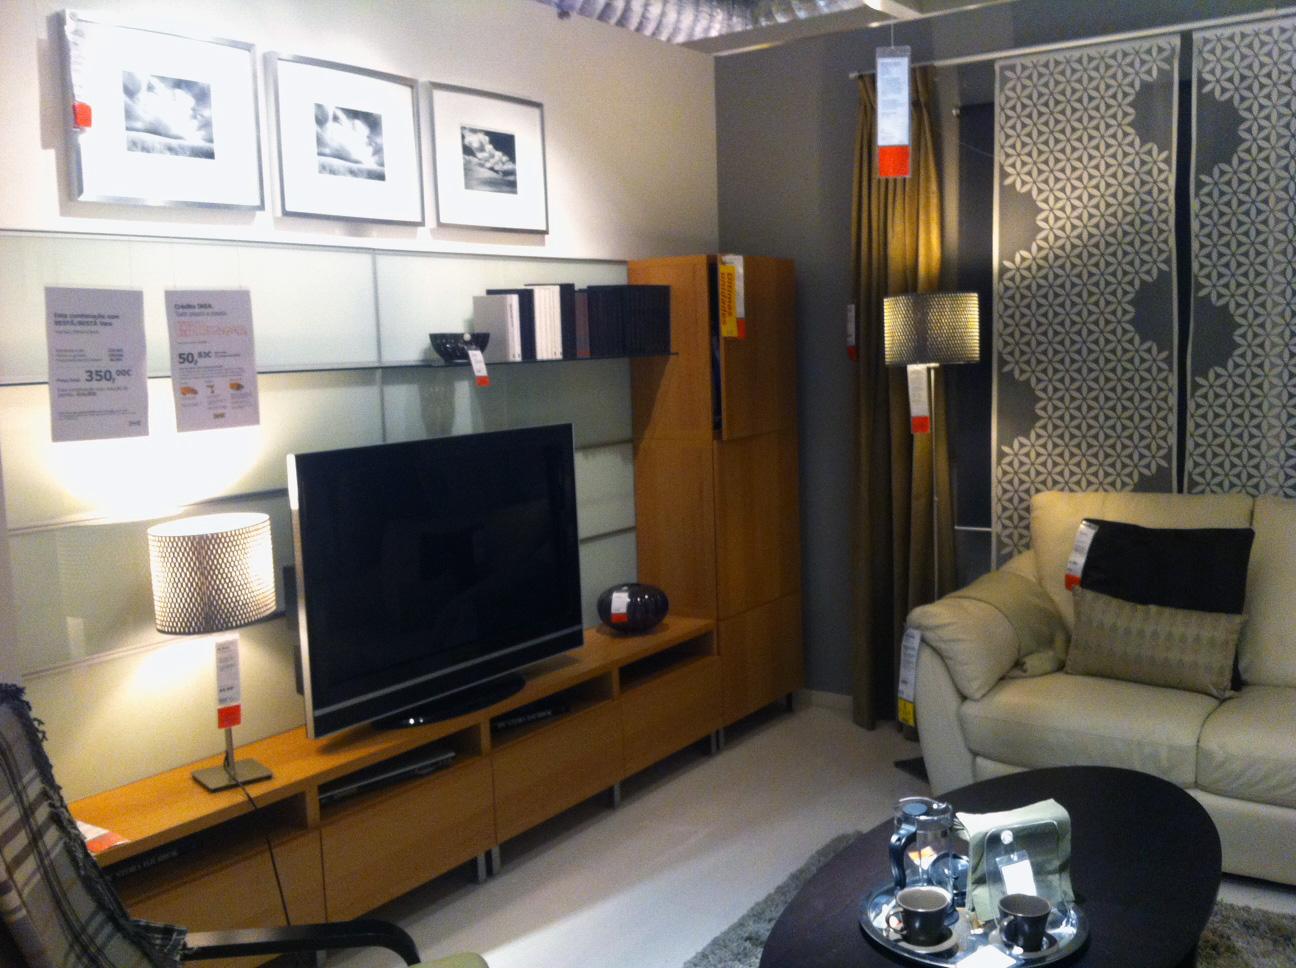 Bricolage e decora o ikea ideia decorativa para sala - Entraditas pequenas ikea ...